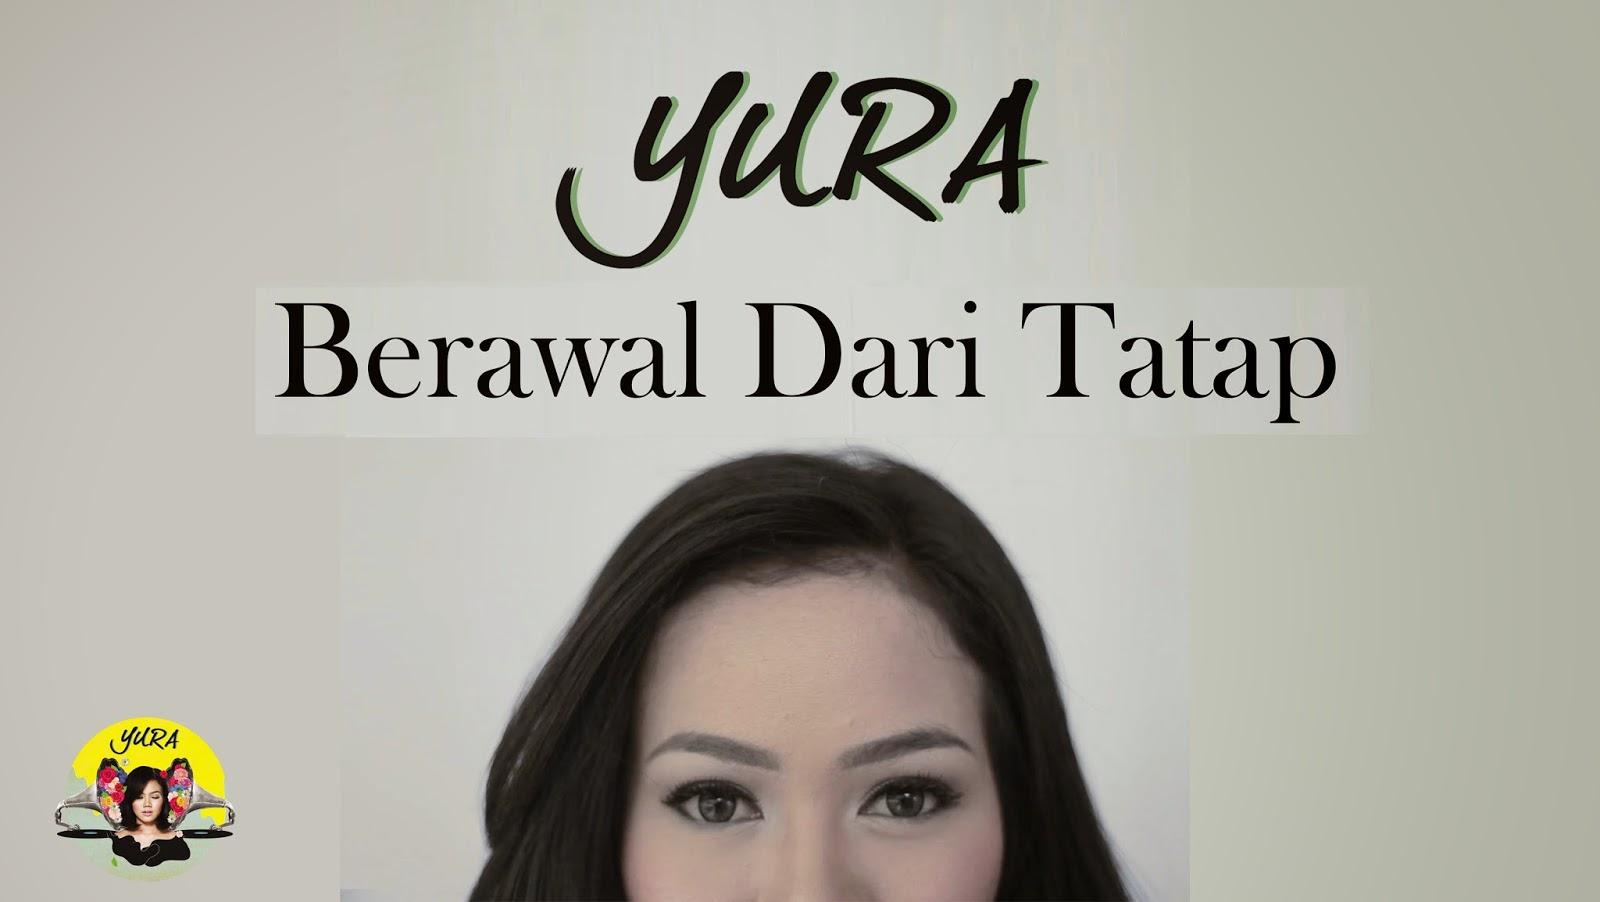 Yura – Berawal Dari Tatap